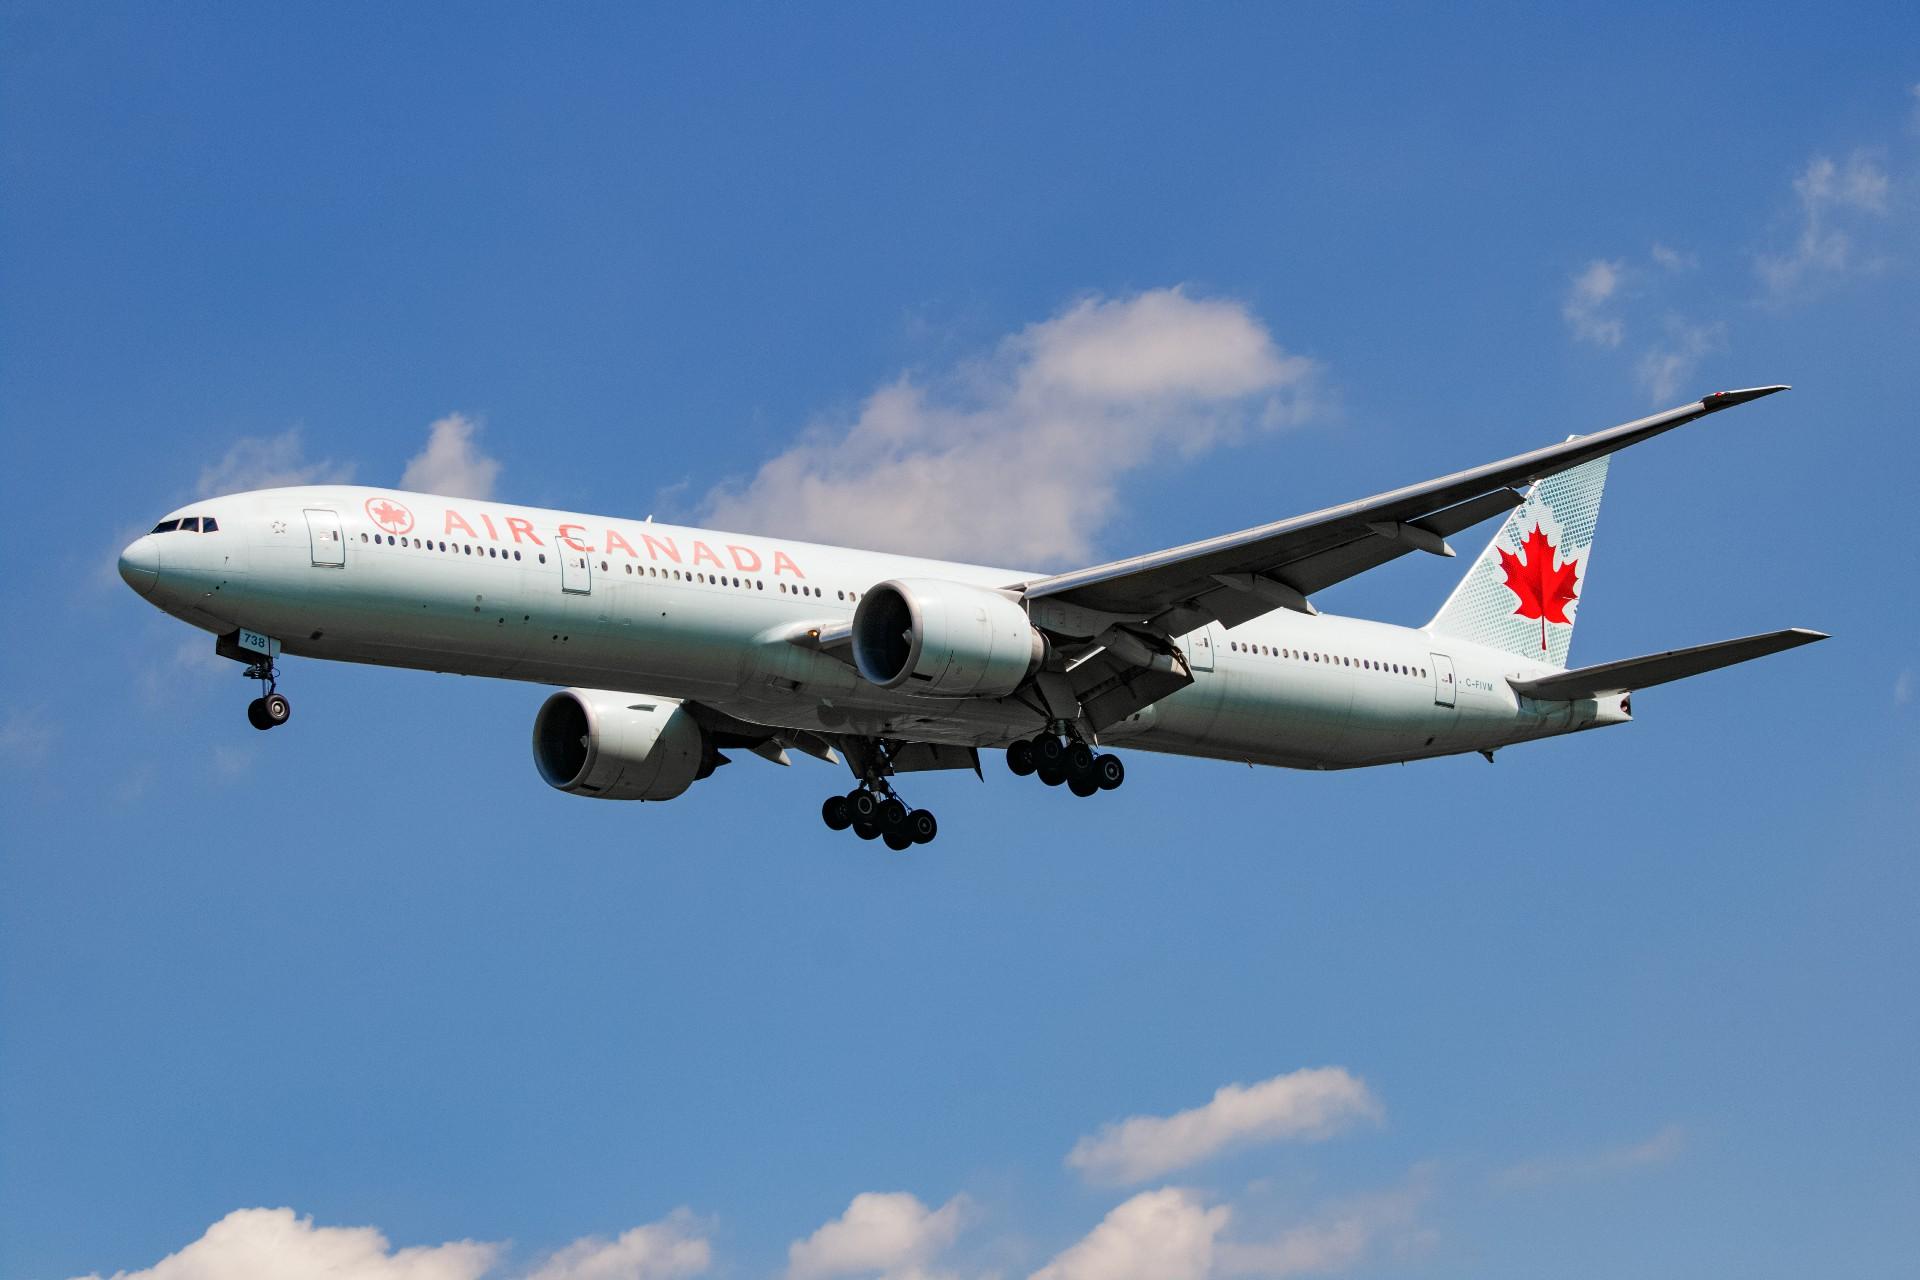 Re:[原创]【Rocketman】8.23 PEK拍机纪行 BOEING 777-300ER C-FIVM 中国北京首都国际机场